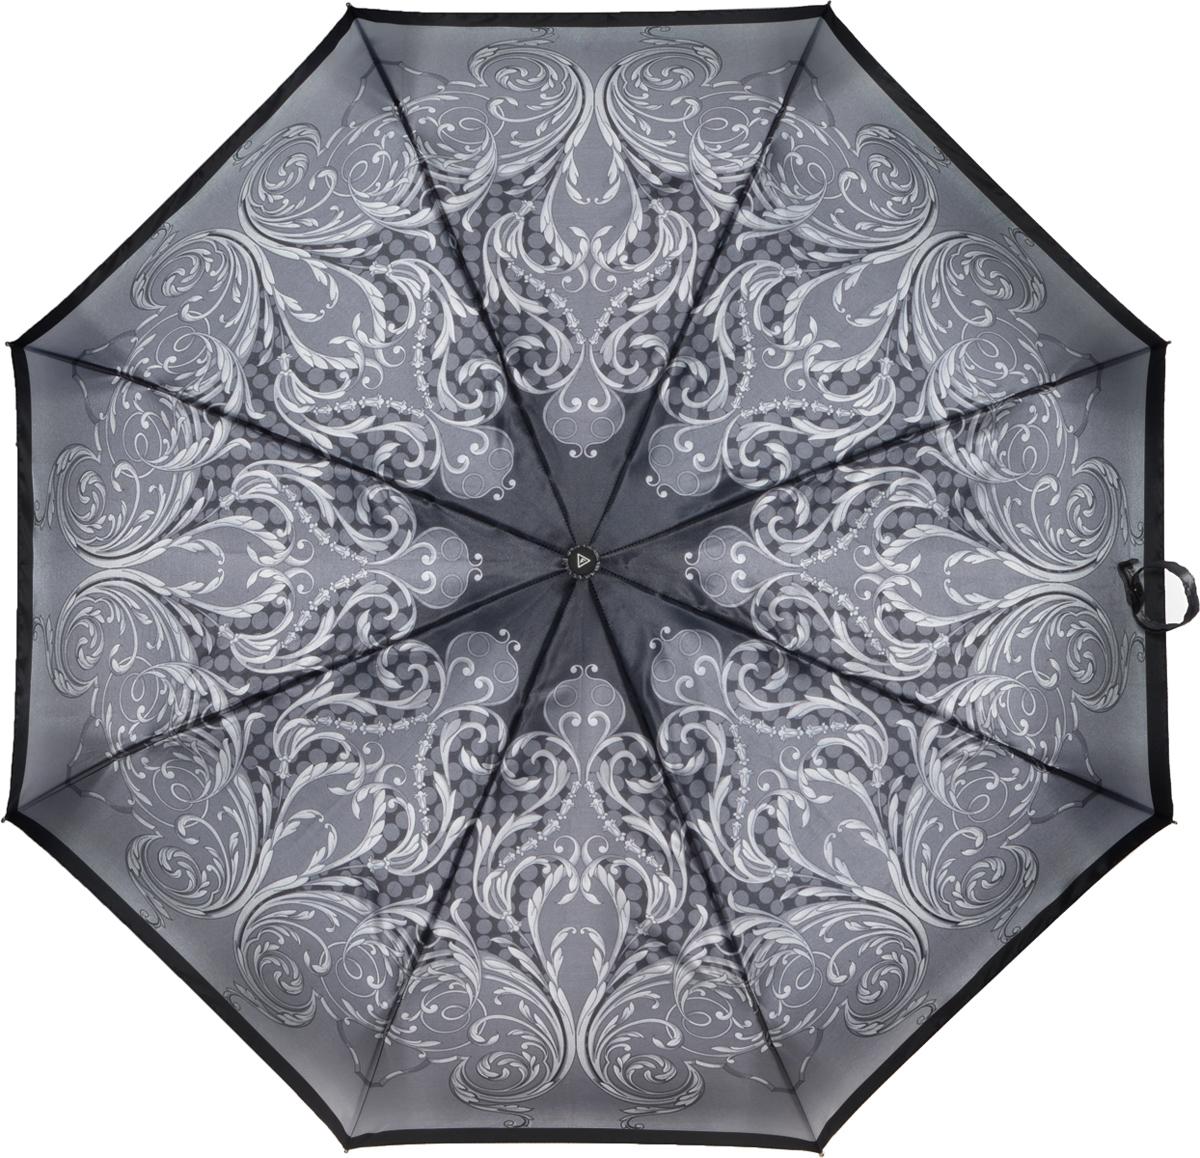 Зонт женский Fabretti, автомат, 3 сложения, цвет: мультиколор. L-16106-12L-16106-12Зонт женский Fabretti, облегченный суперавтомат, 3 сложения